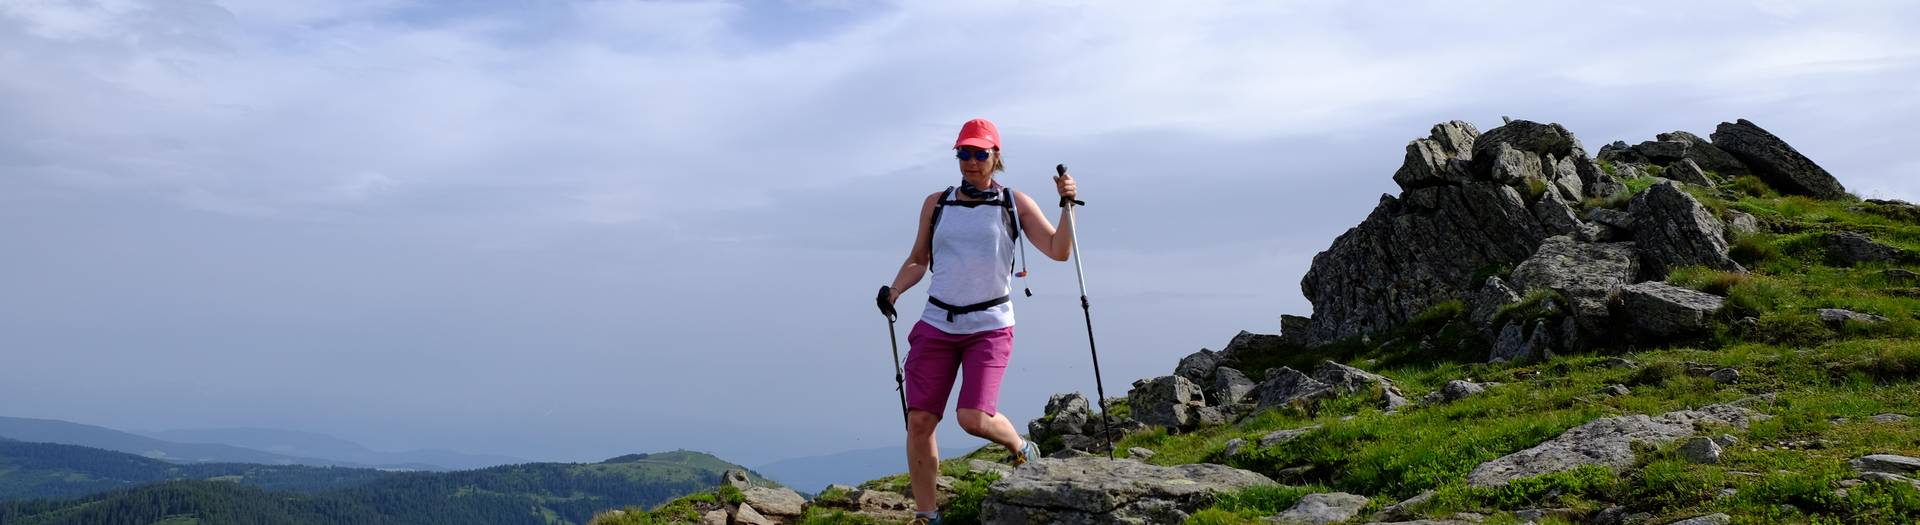 Highlander Wanderevent Sabrina Schuett